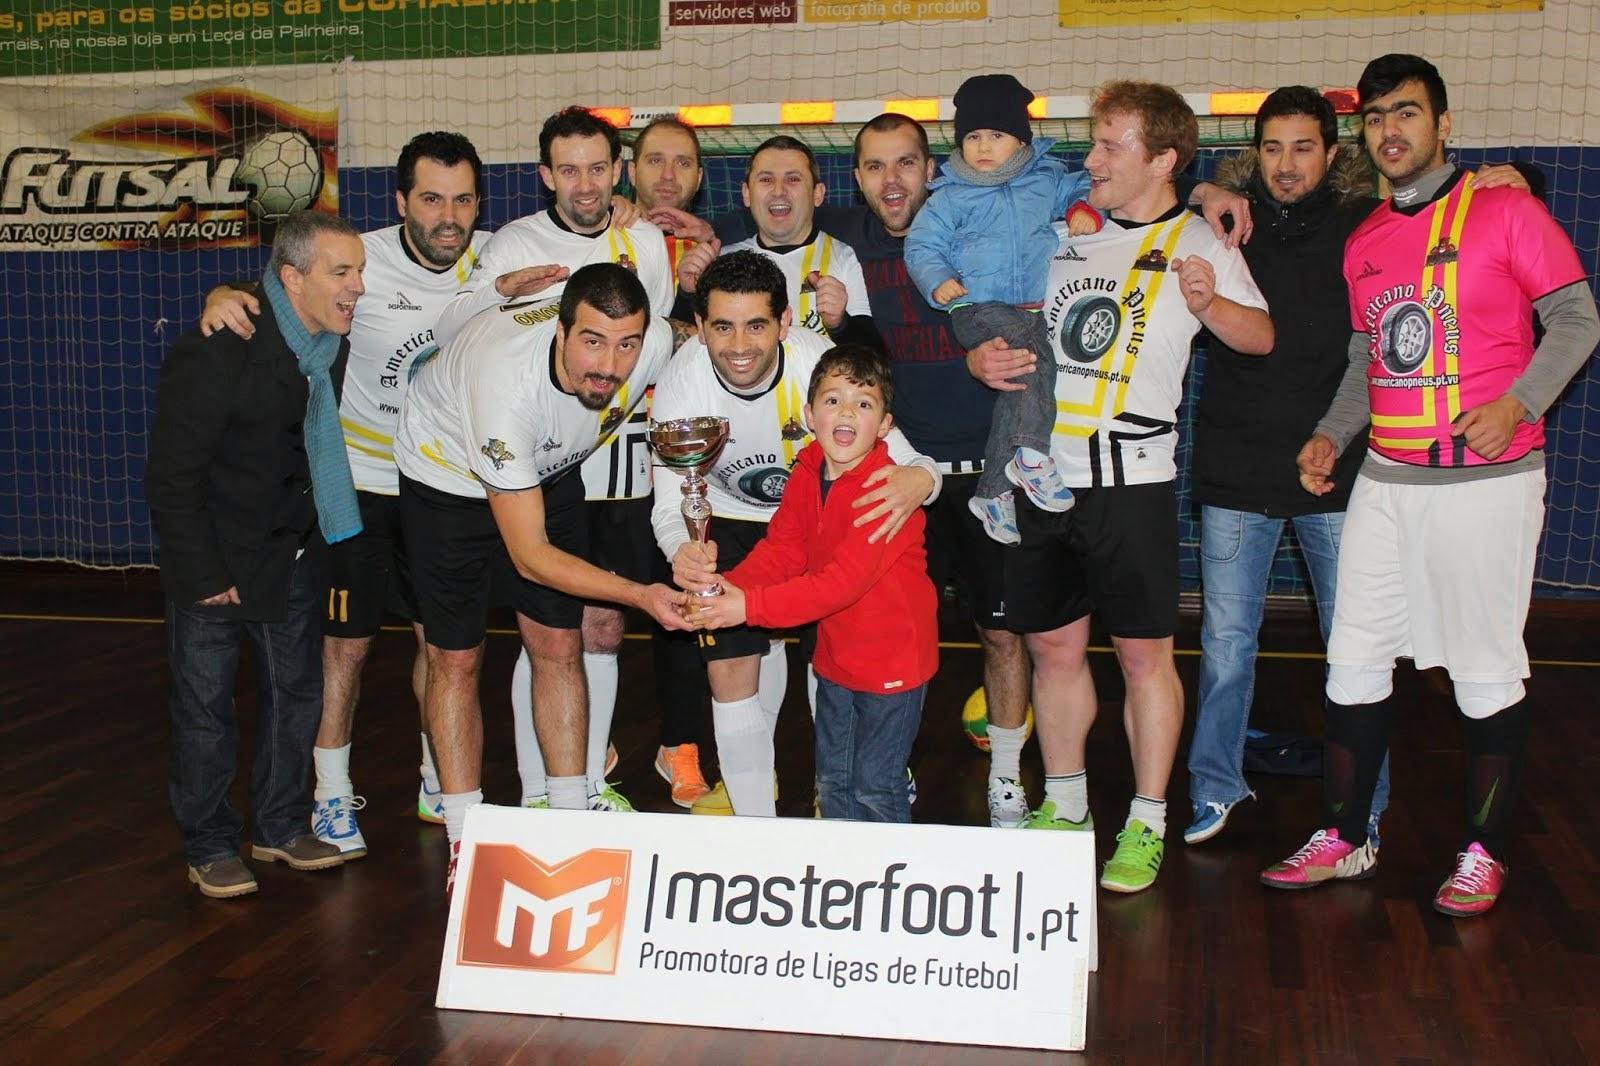 VENCEDOR da Masterfoot Futsal Cup